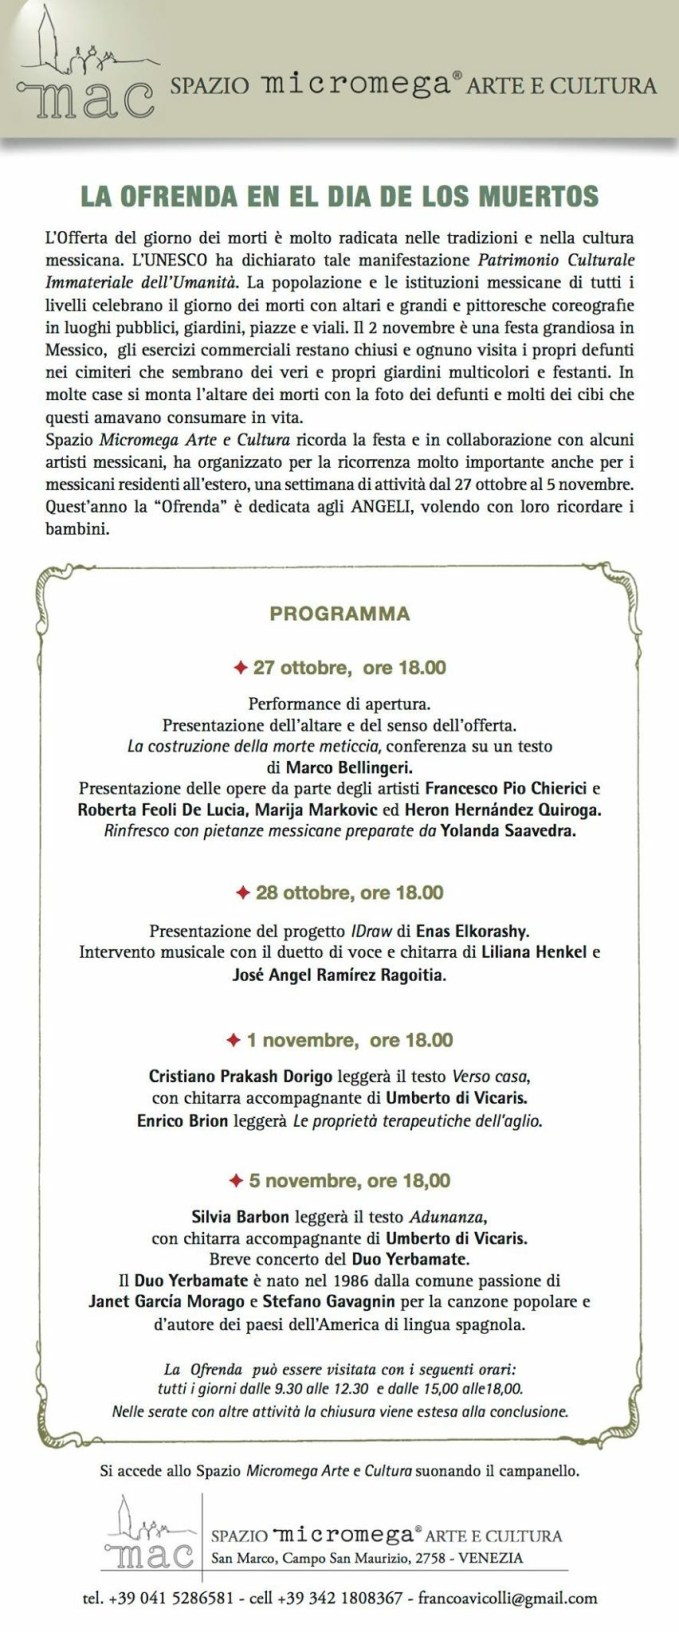 dia-de-muertos-in-italia-2016-venezia-programma